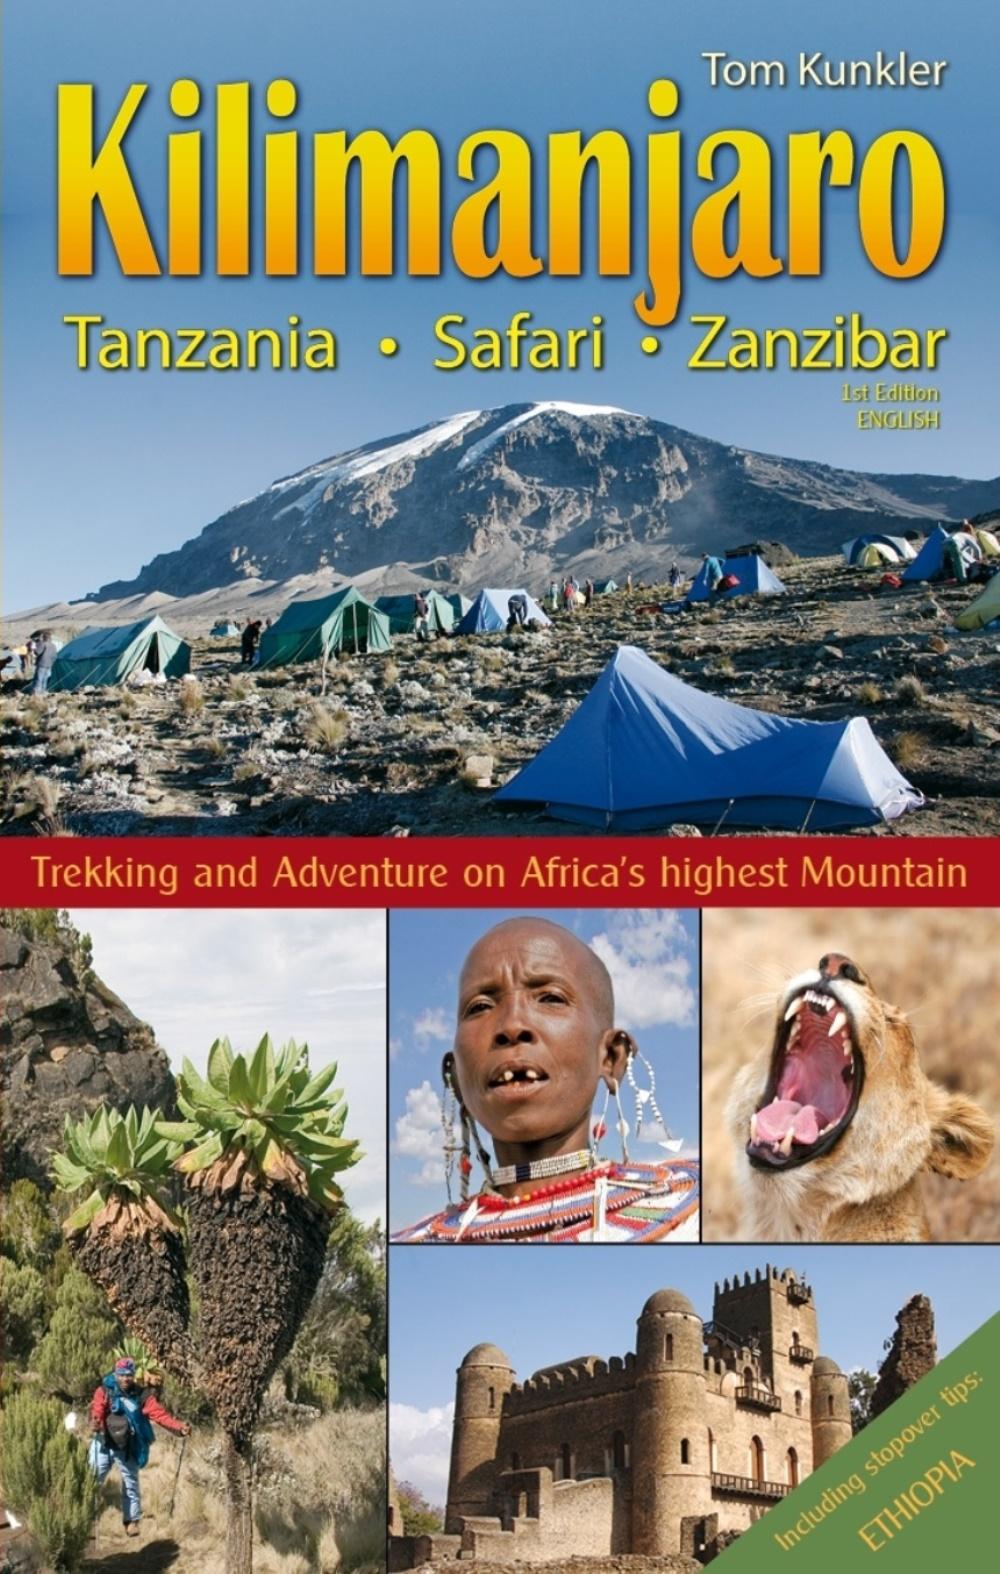 Wandelgids - Klimgids Kilimanjaro, Tanzania, Safari, Zanzibar   Tom Kunkler   Tom Kunkler